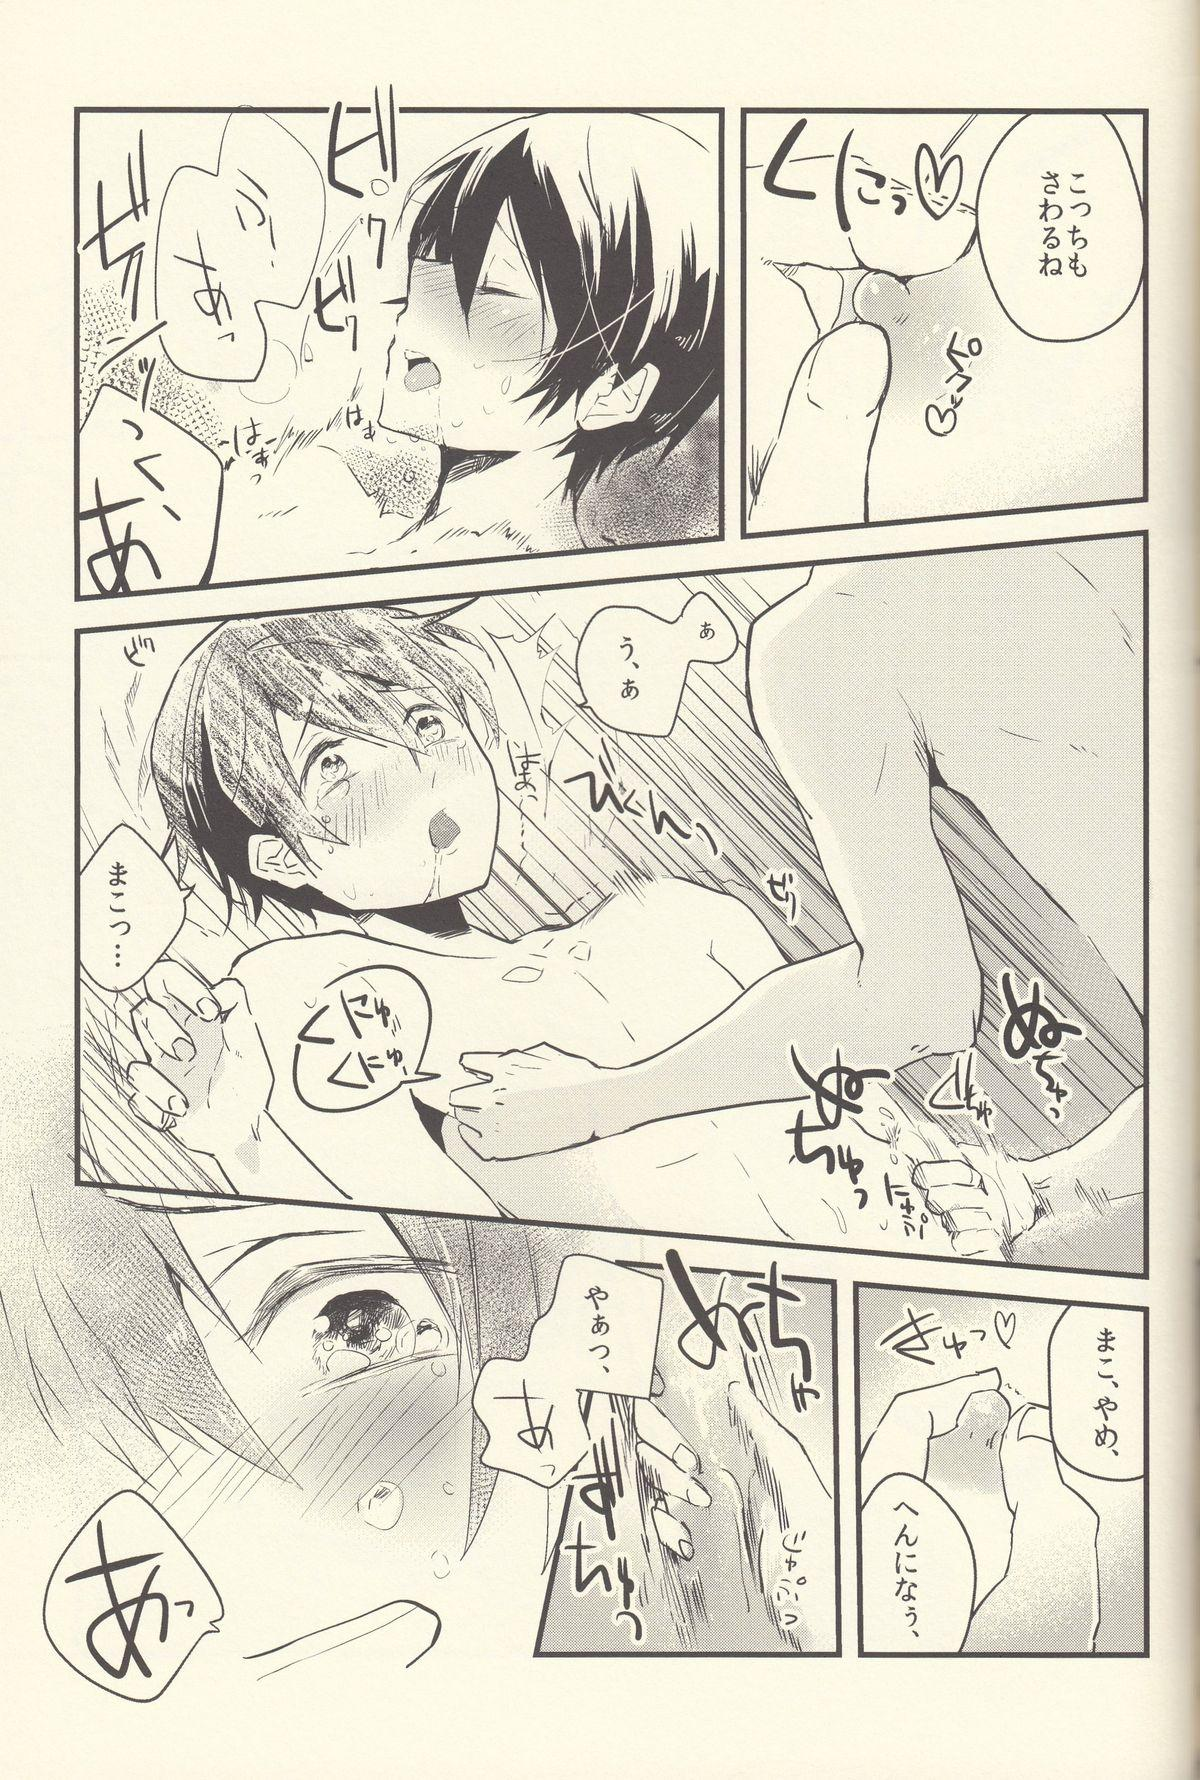 Shiofuki no Friendship - Makoto ♥ Haruka Squirting Anthology 56